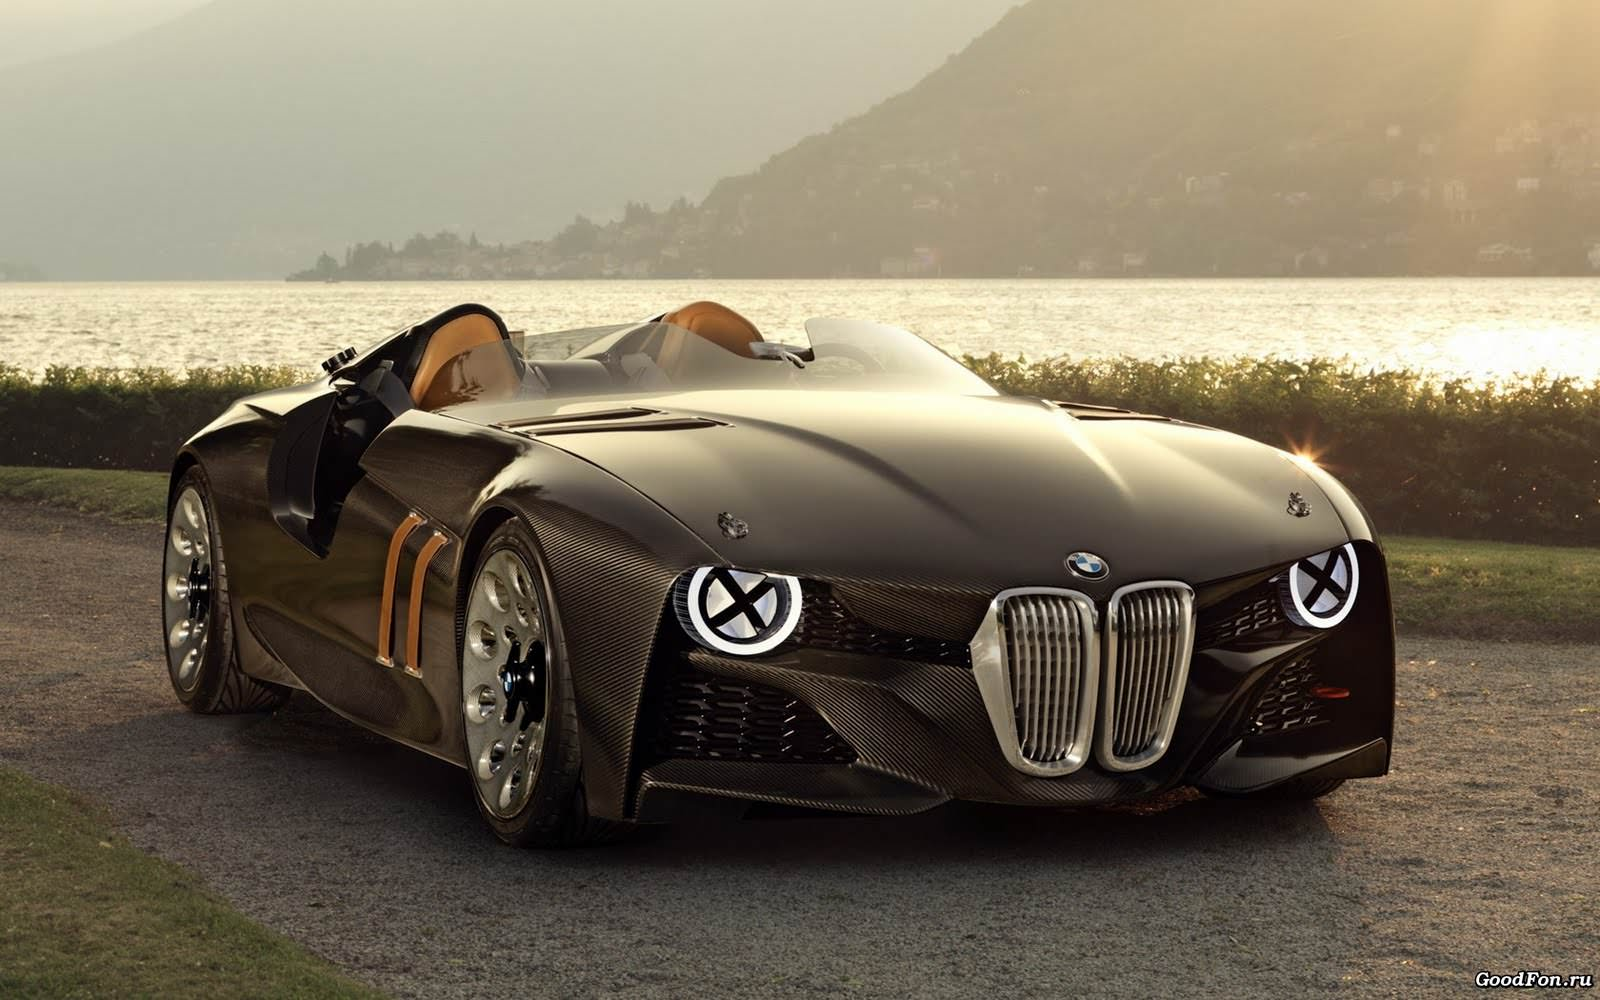 Car,Background,Designs,BMW,Lake